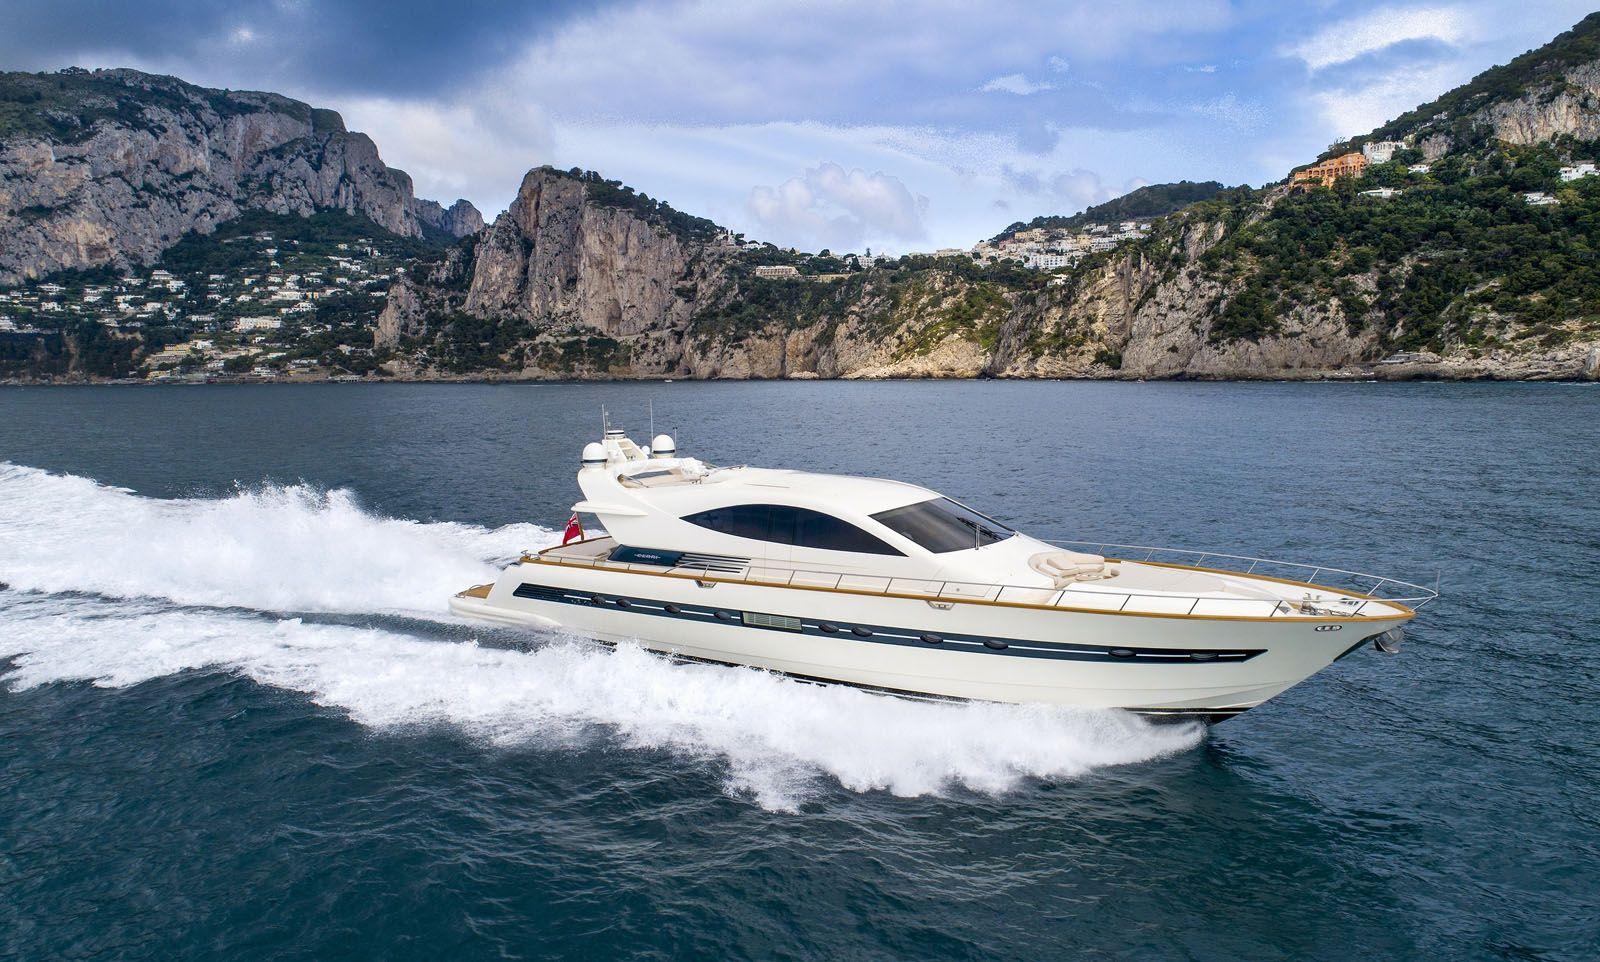 Moki - Cerri 86 - Day Charter - 4 cabins - Amalfi - Sorrento - Capri